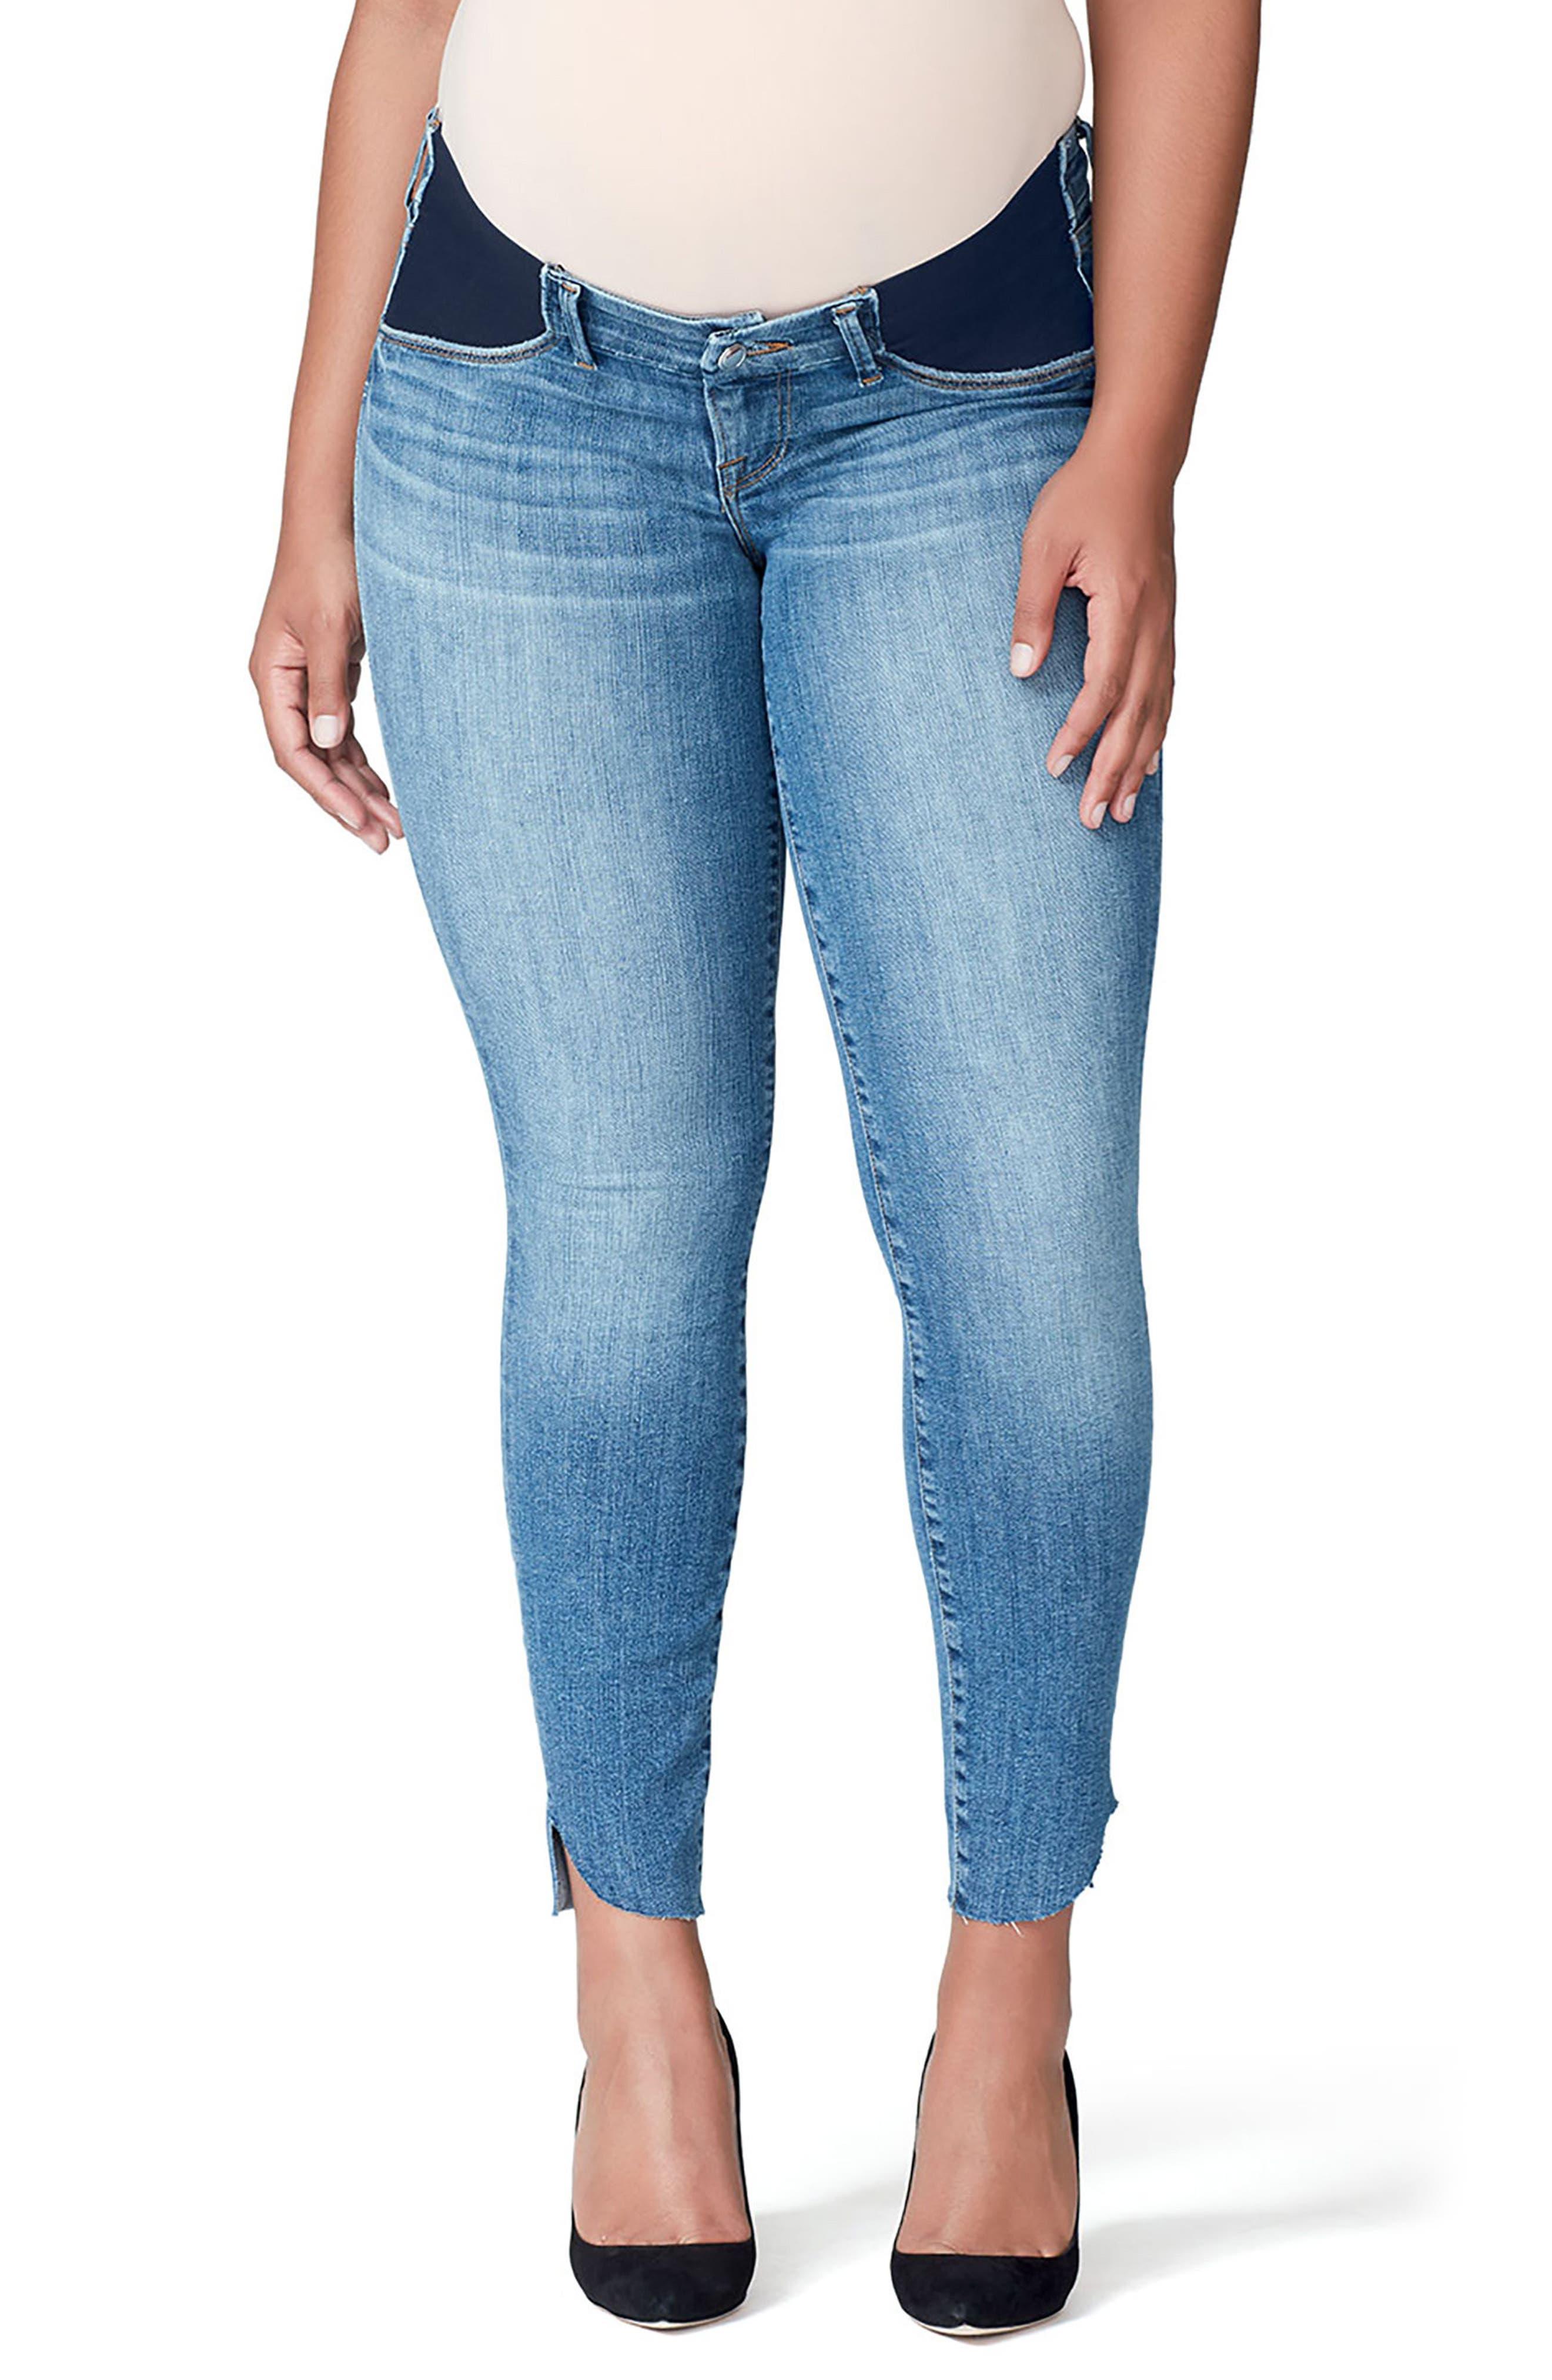 Alternate Image 1 Selected - Good American Good Mama The Honeymoon Low Rise Cascade Hem Maternity Skinny Jeans